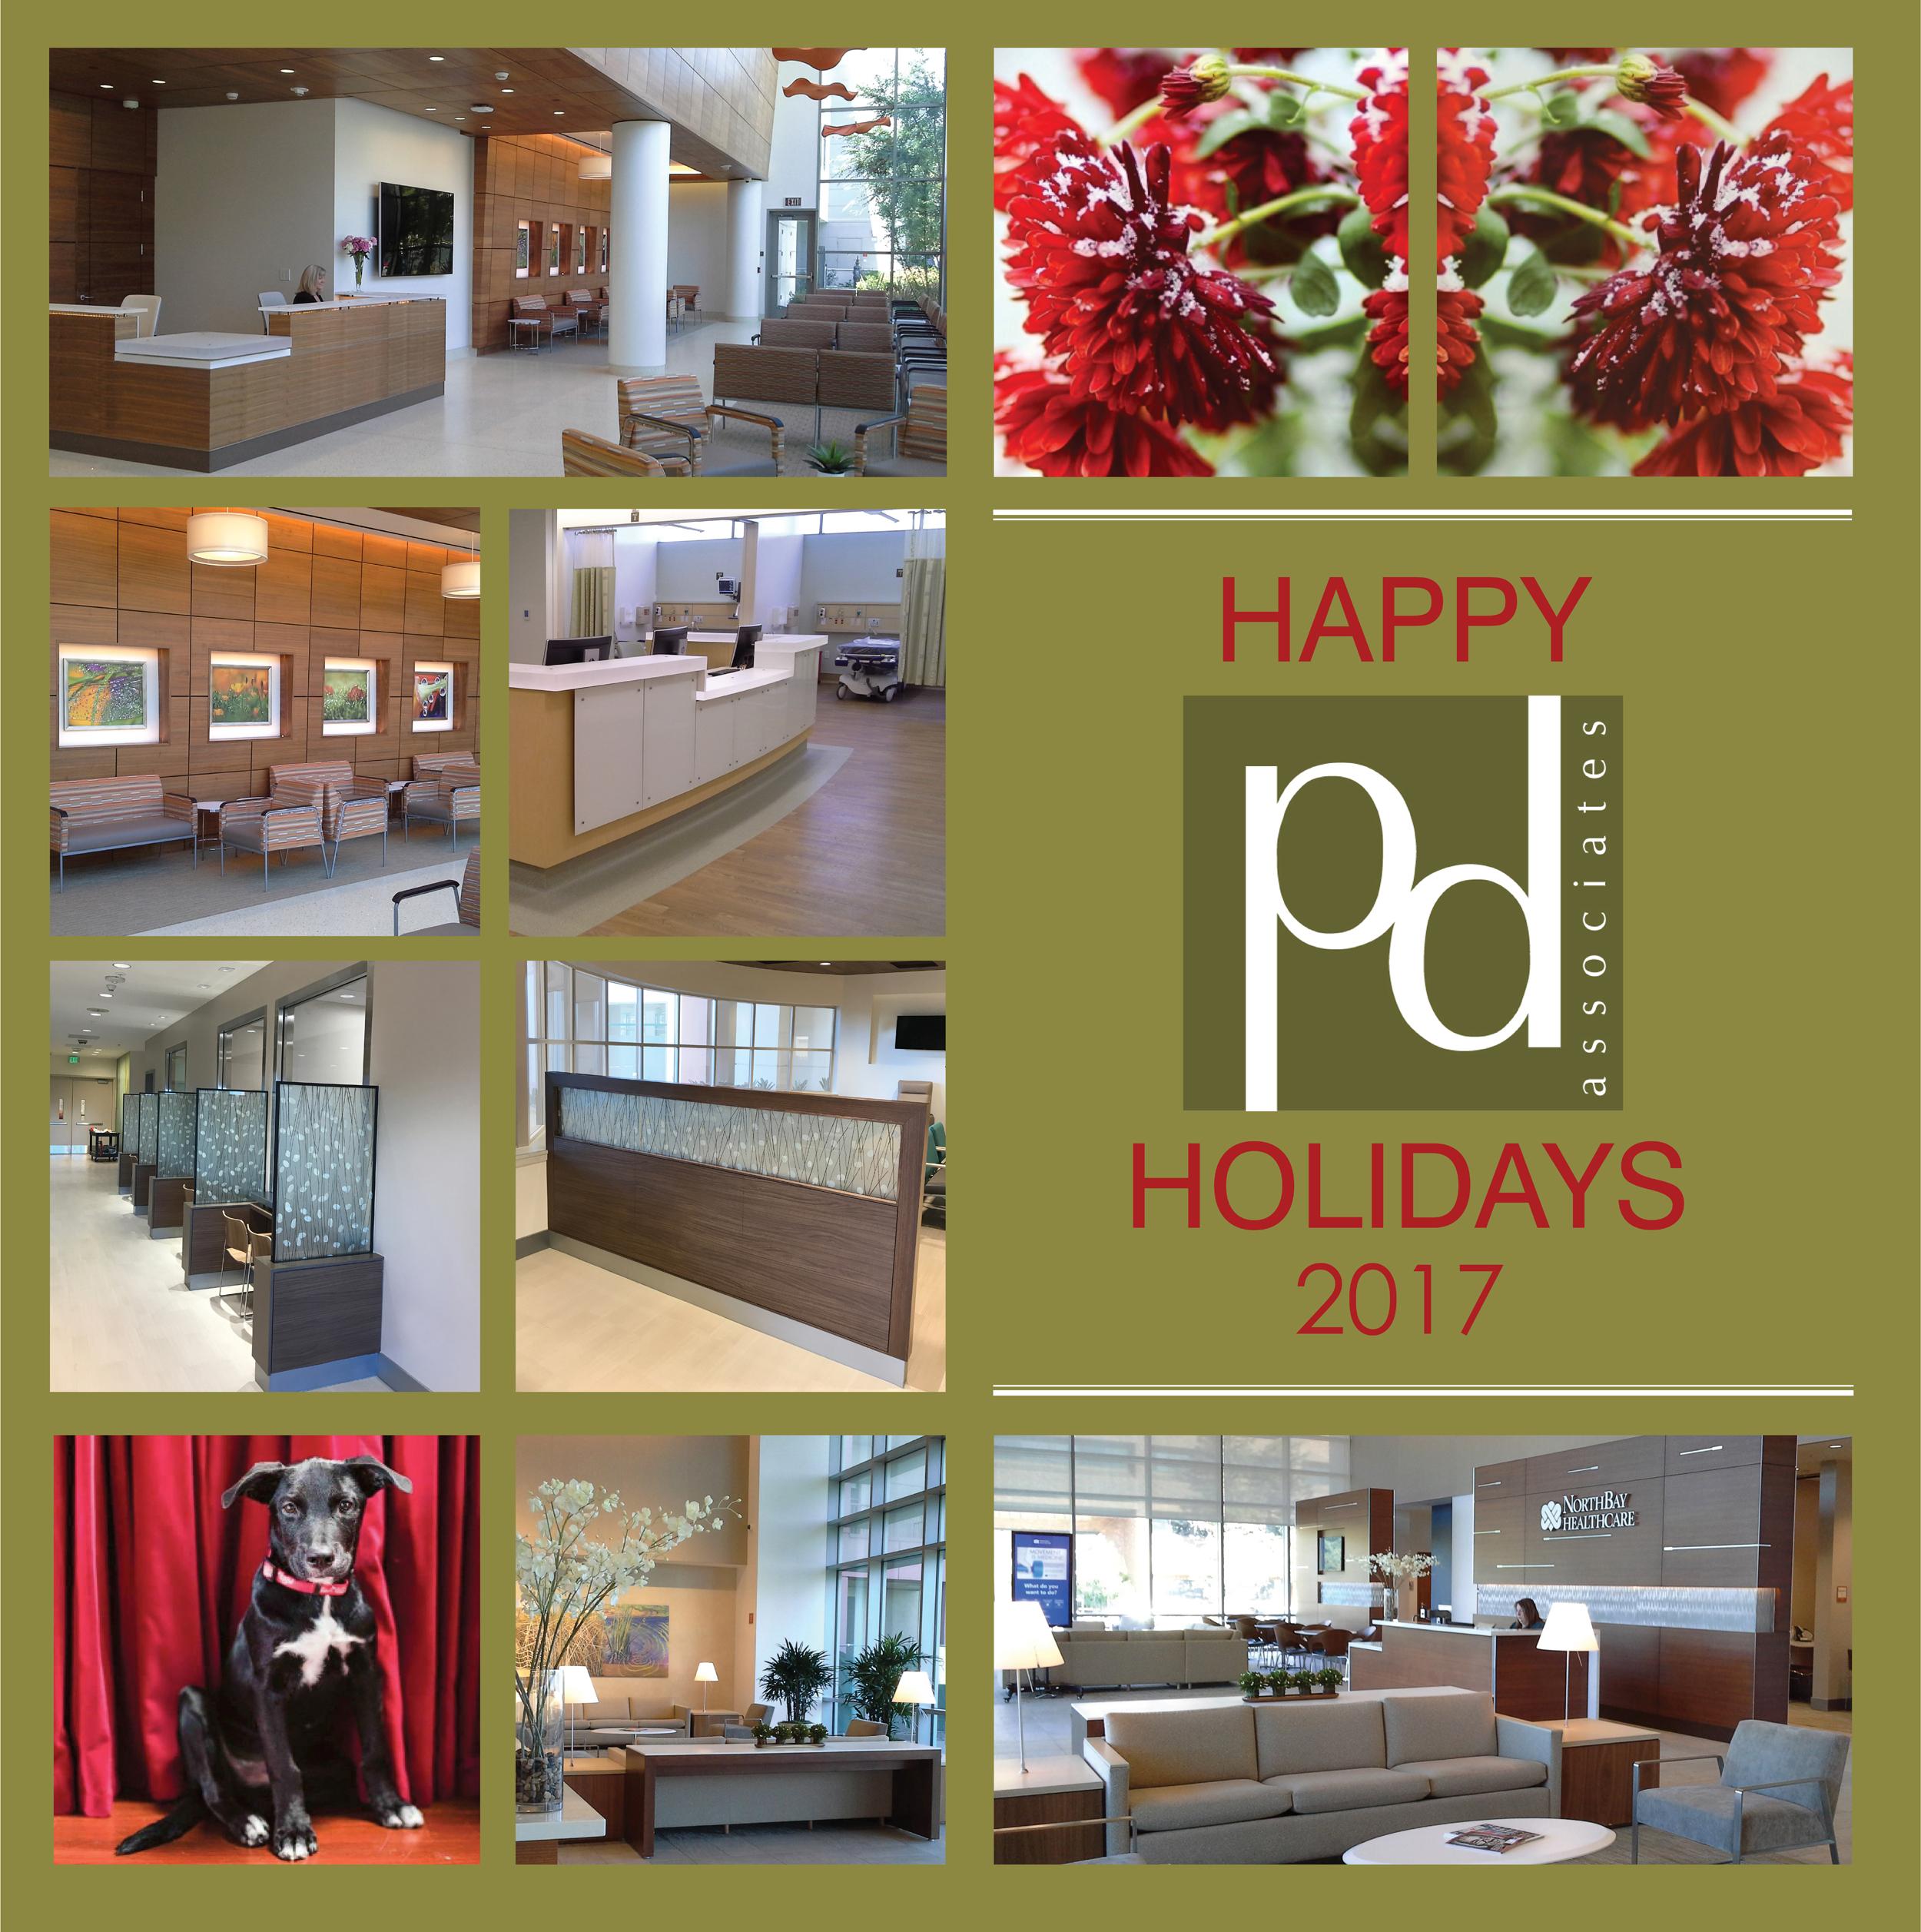 Holiday Card Blog.jpg